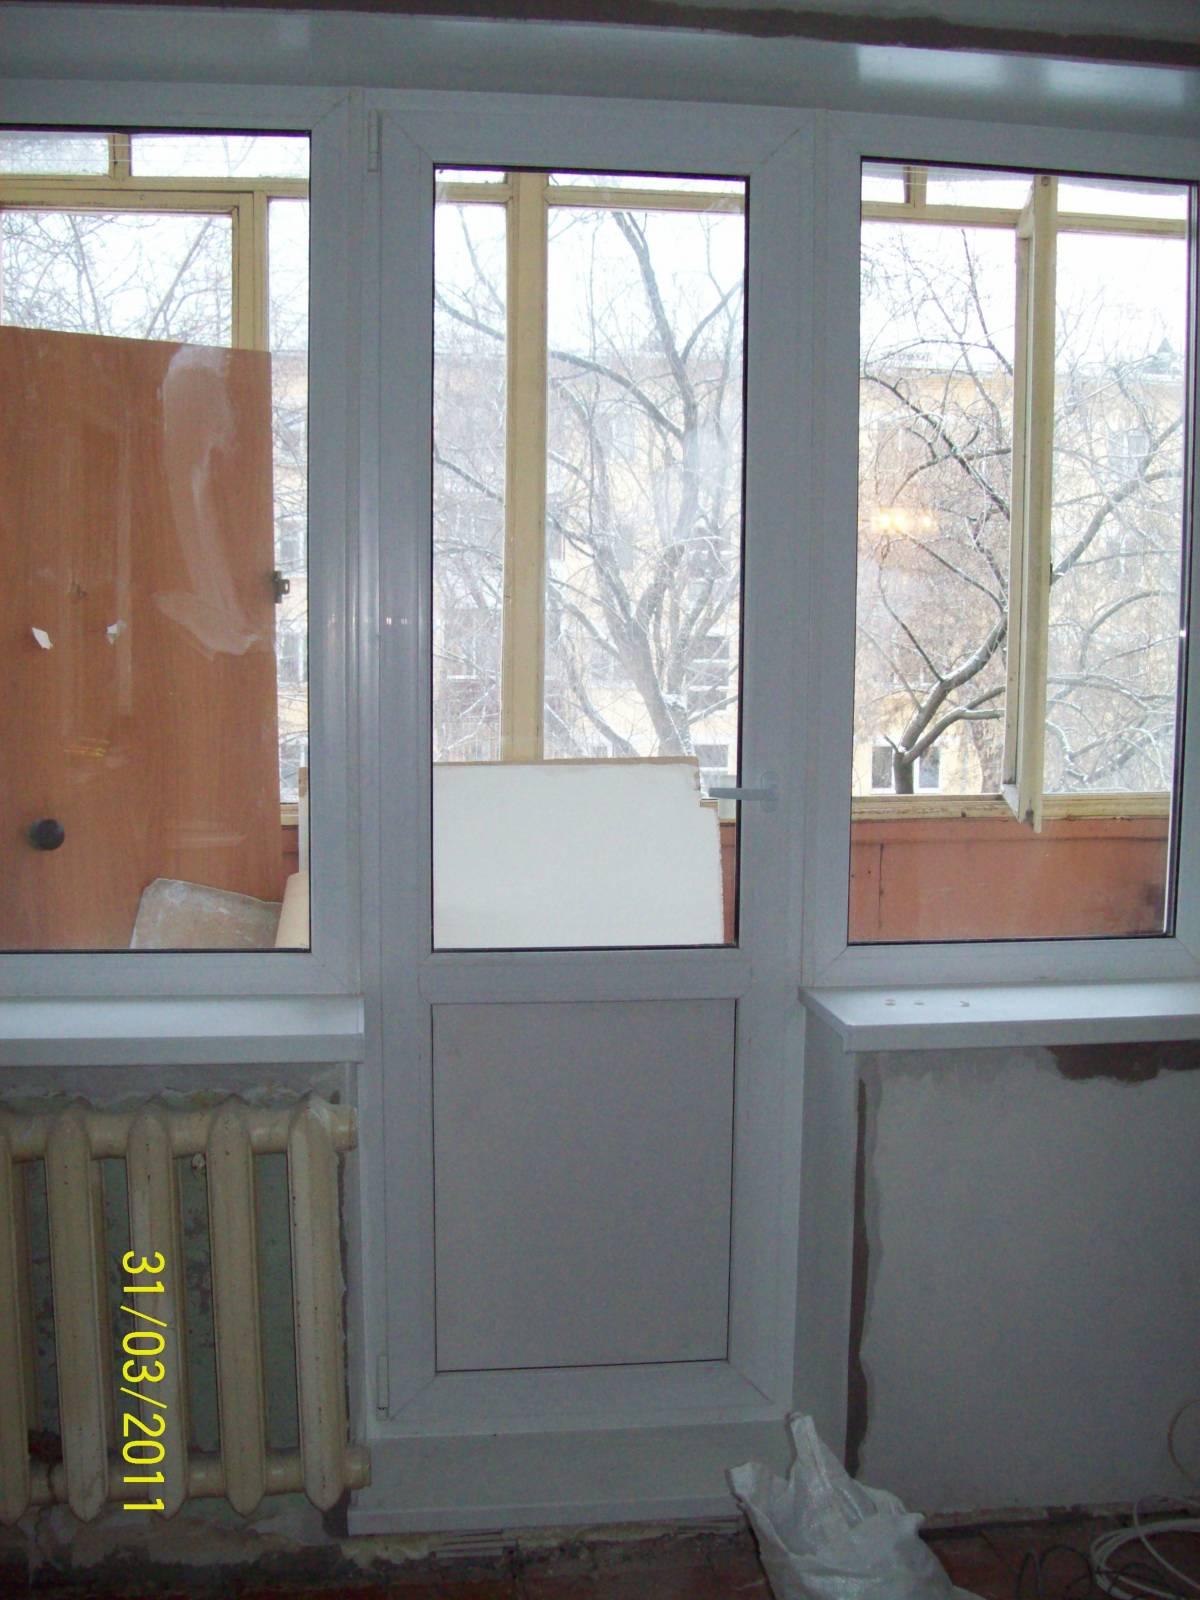 Балконный блок Чебурашка rehau sib 70мм 2100х2100 festima.ru.